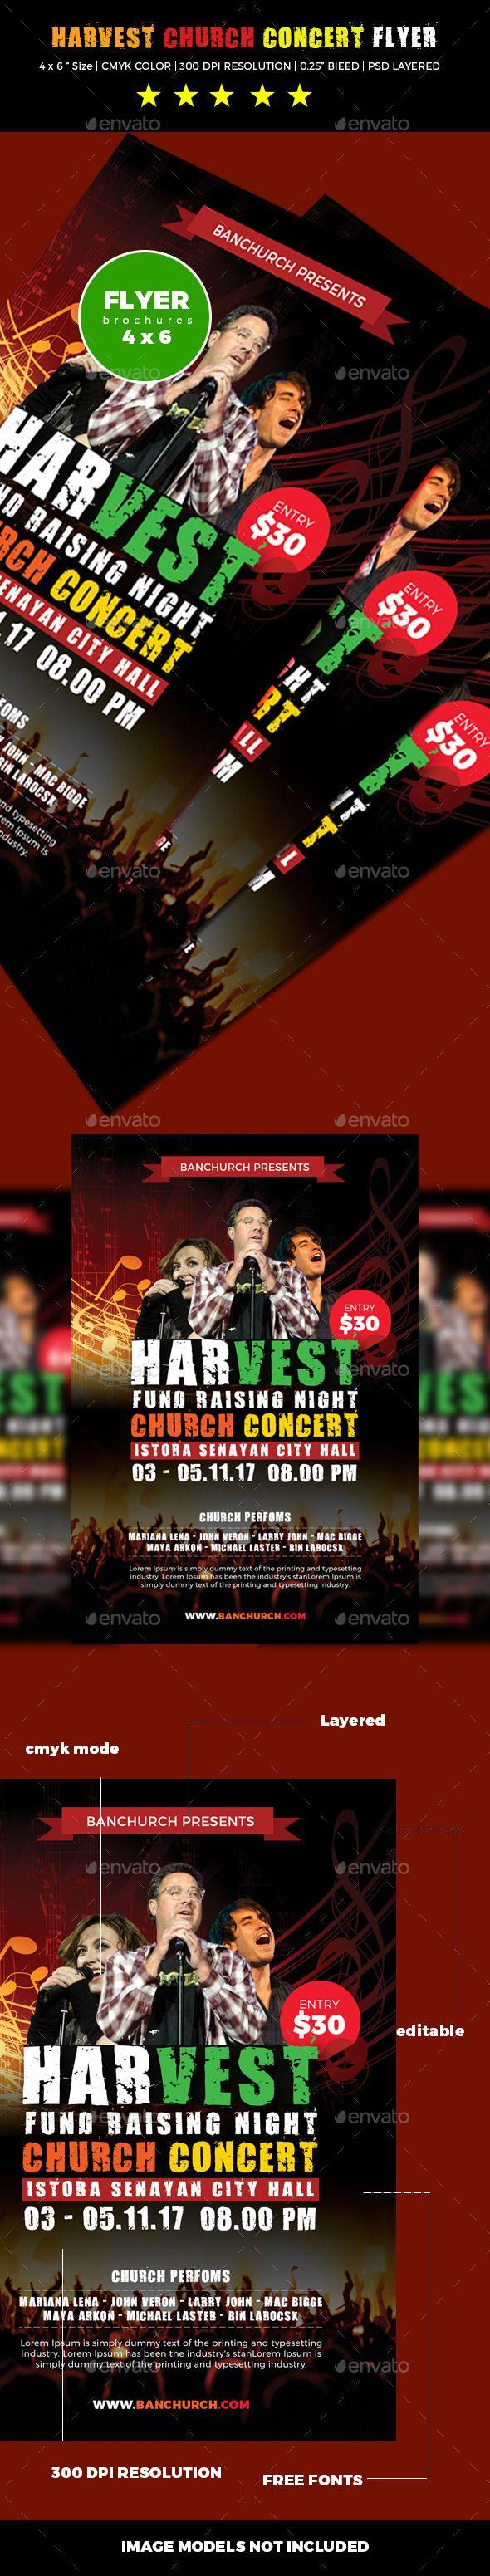 Harvest Church Concert